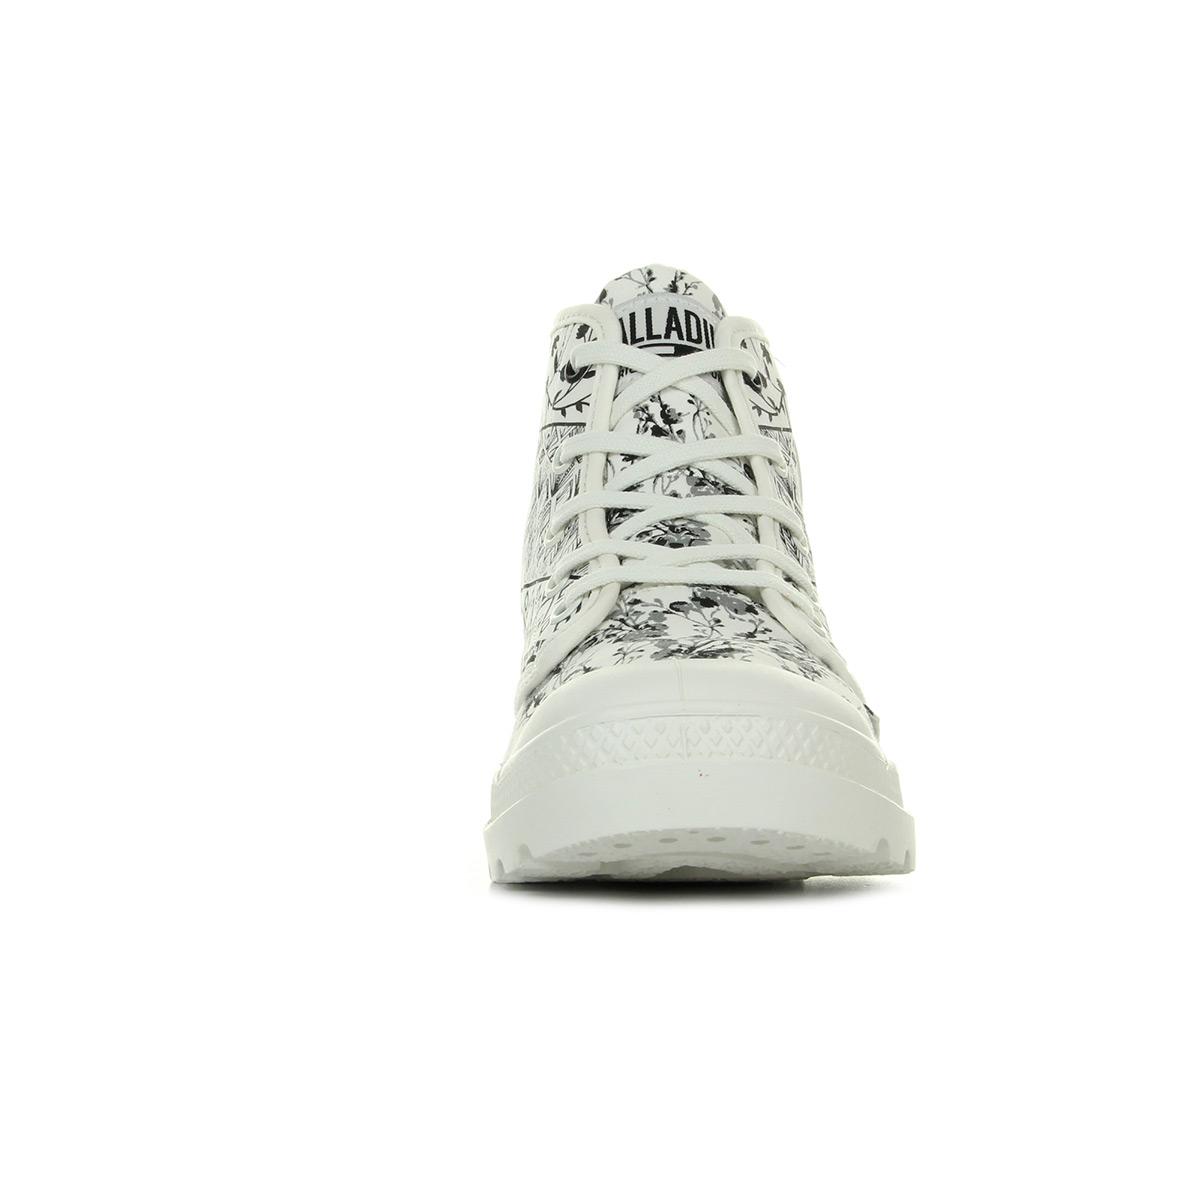 Boots Palladium Pampa Hi Ethnic Black- Starwhite iH6Wy8W